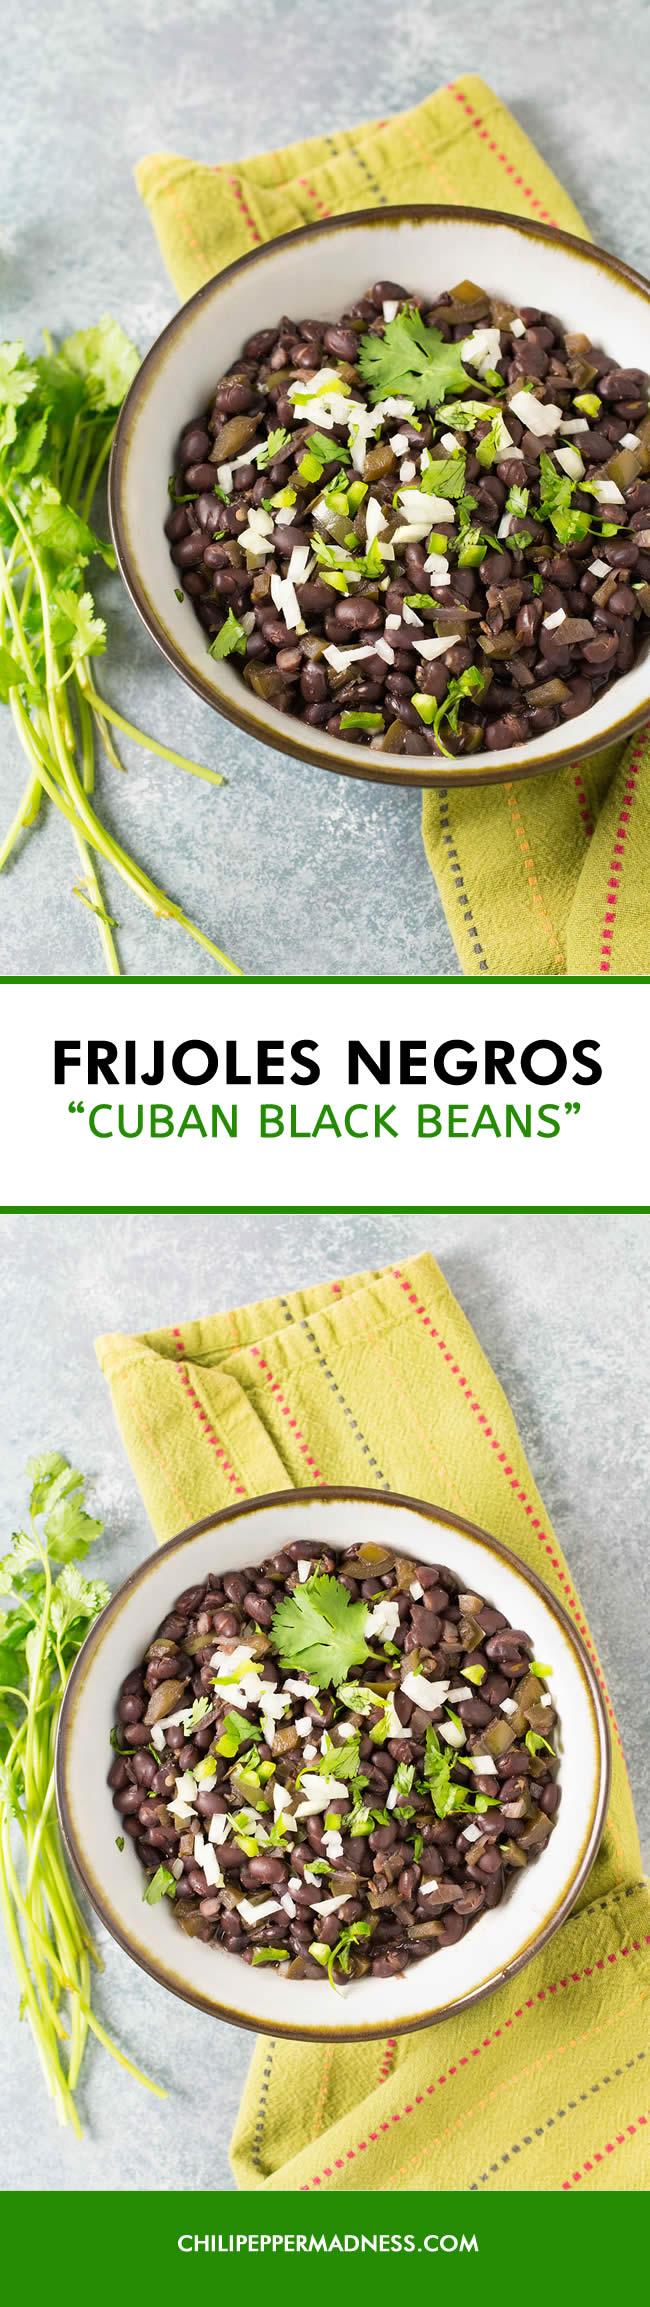 Frijoles Negros - Cuban Black Beans